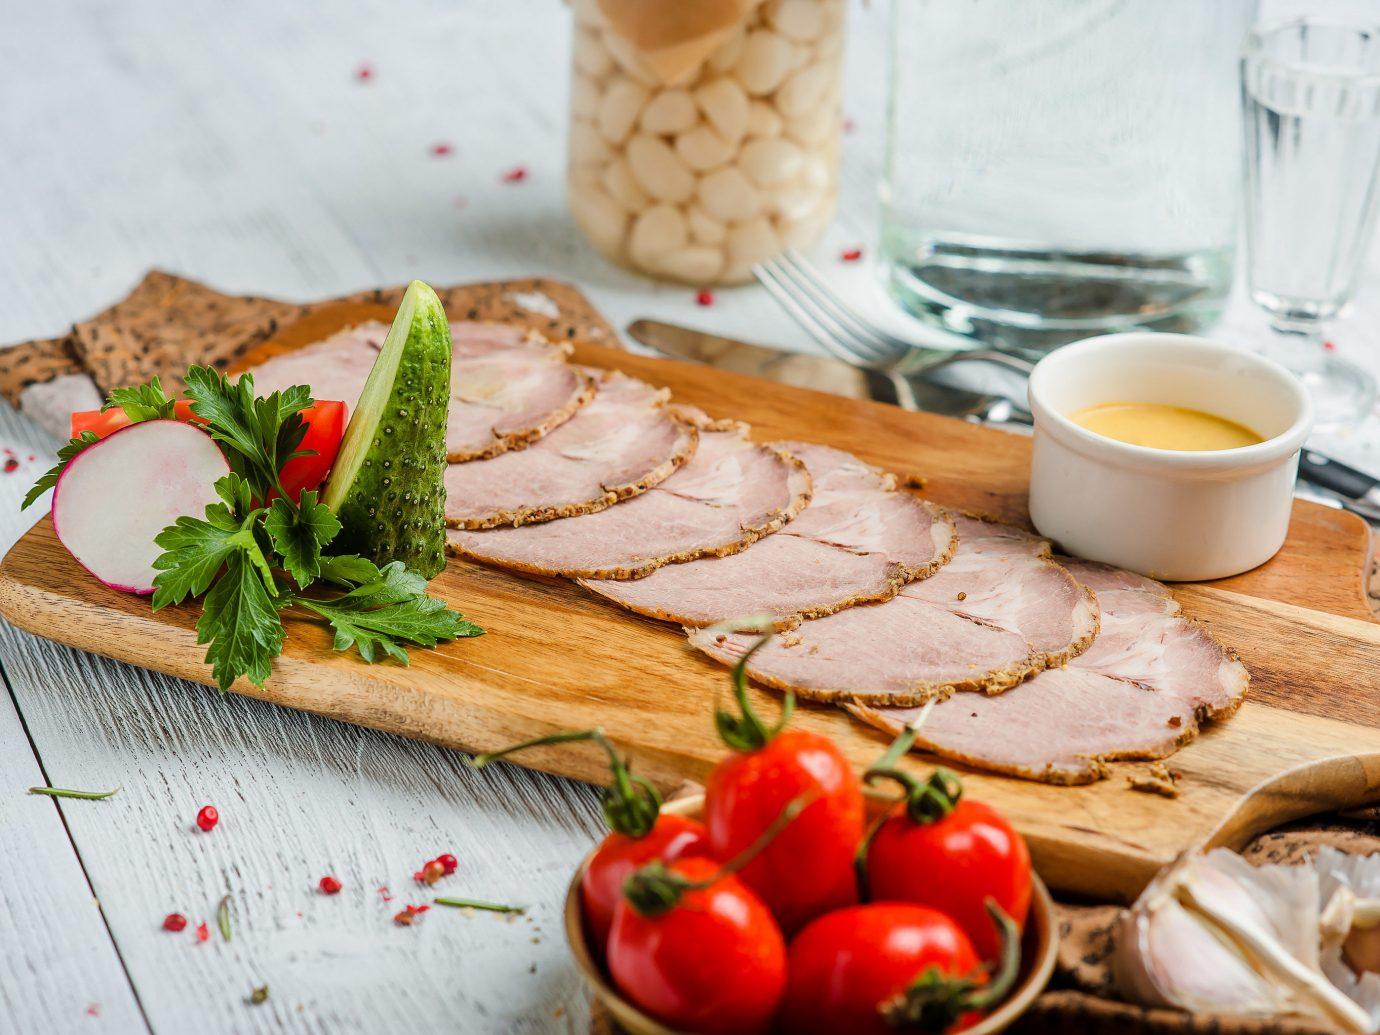 Arts + Culture Hotels Jetsetter Guides food plate dish meat fruit full breakfast turkey ham breakfast cold cut recipe galantine pâté brunch fresh